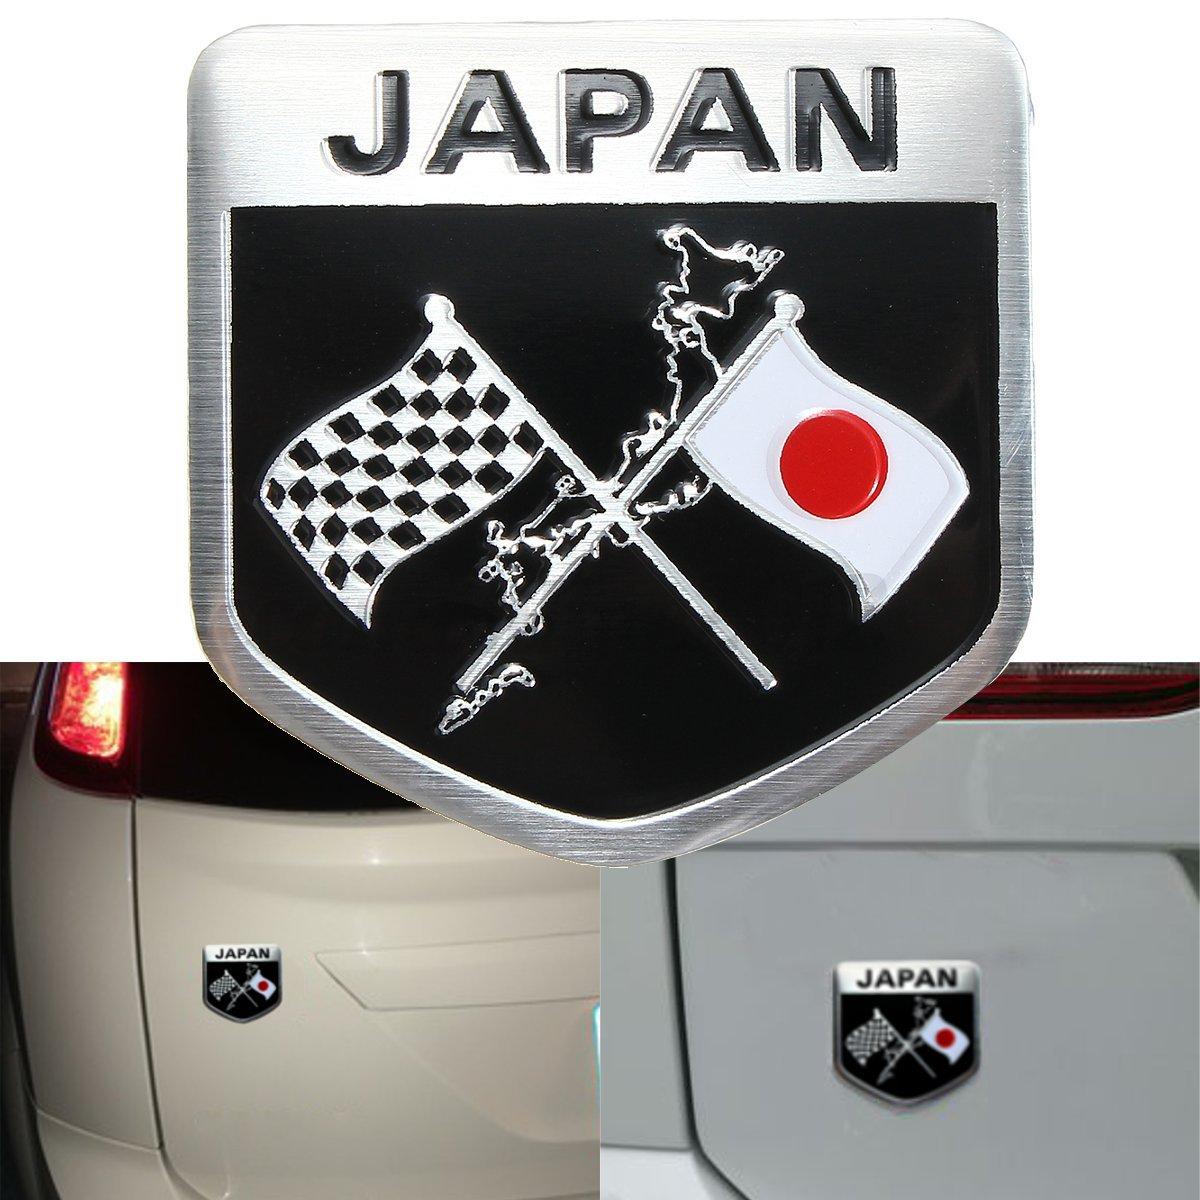 Japanese japan sun flag badge emblem decal sticker car trunk body grille fender